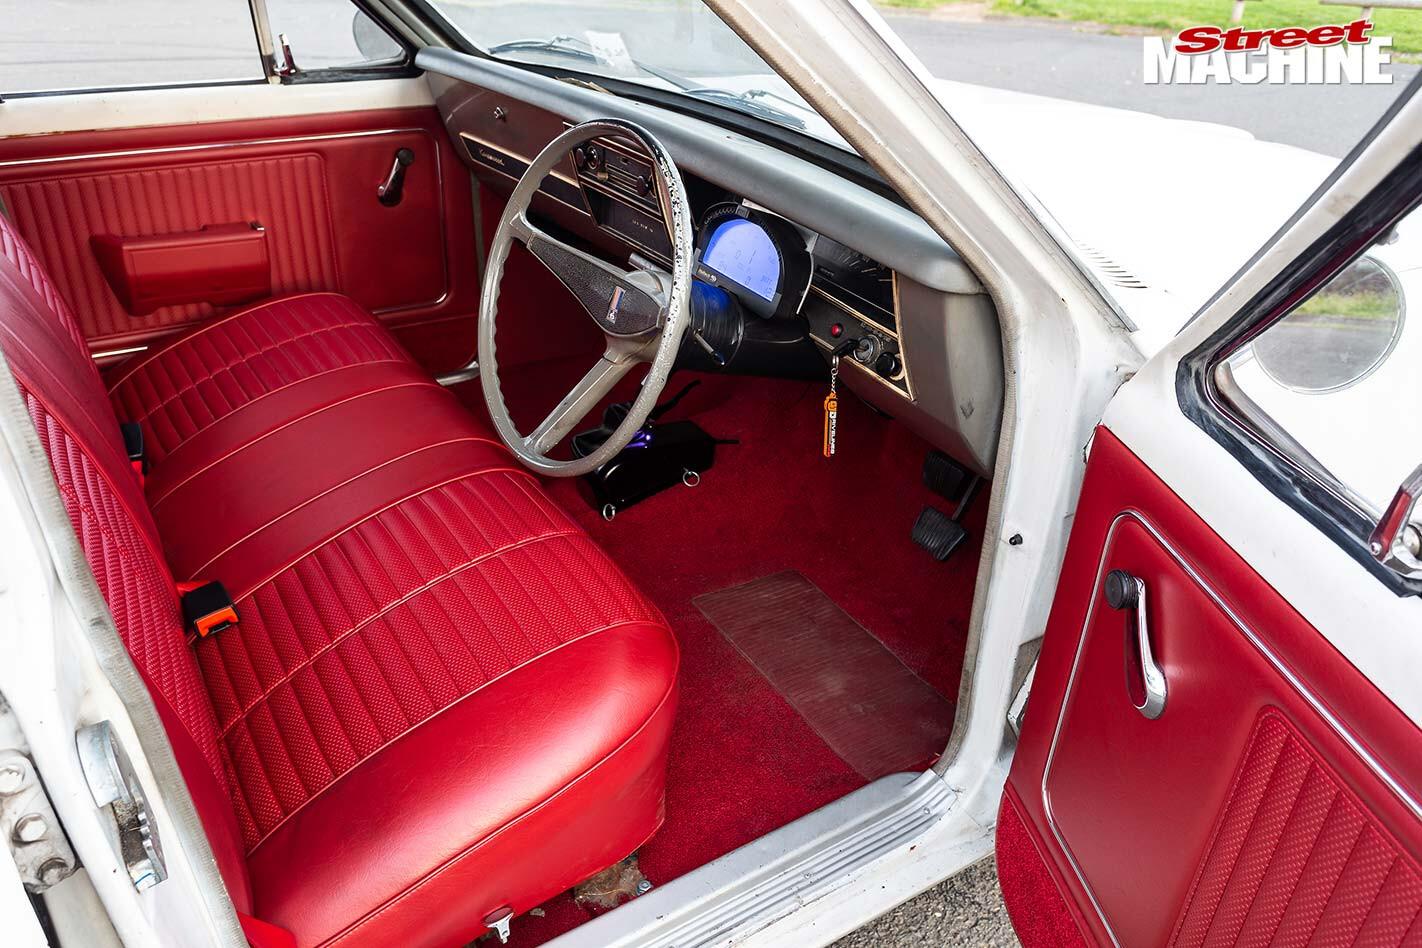 Holden HK wagon interior